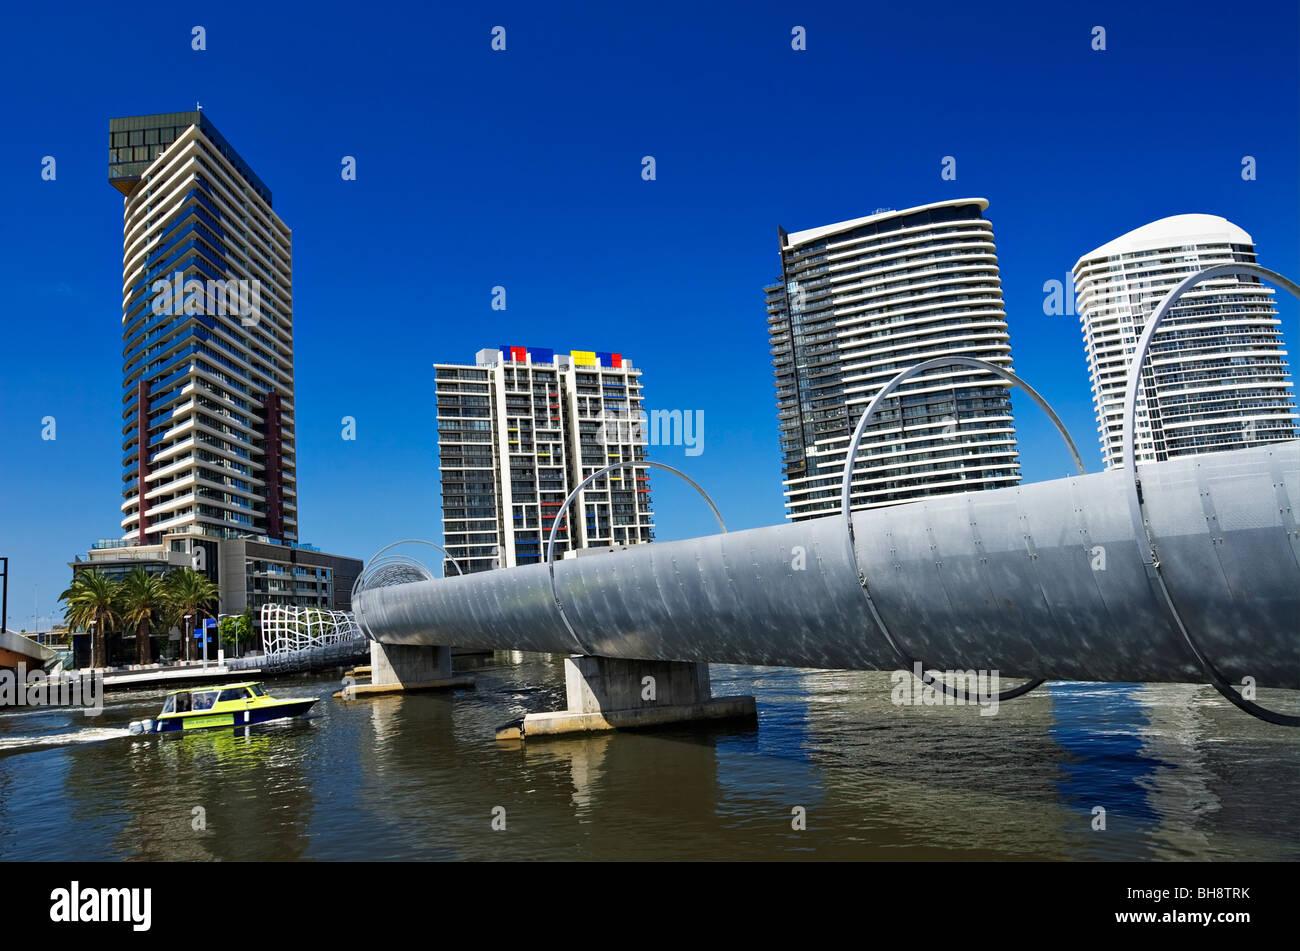 Melbourne Bridges / The Webb Bridge in Melbourne Docklands / Melbourne Victoria Australia. - Stock Image